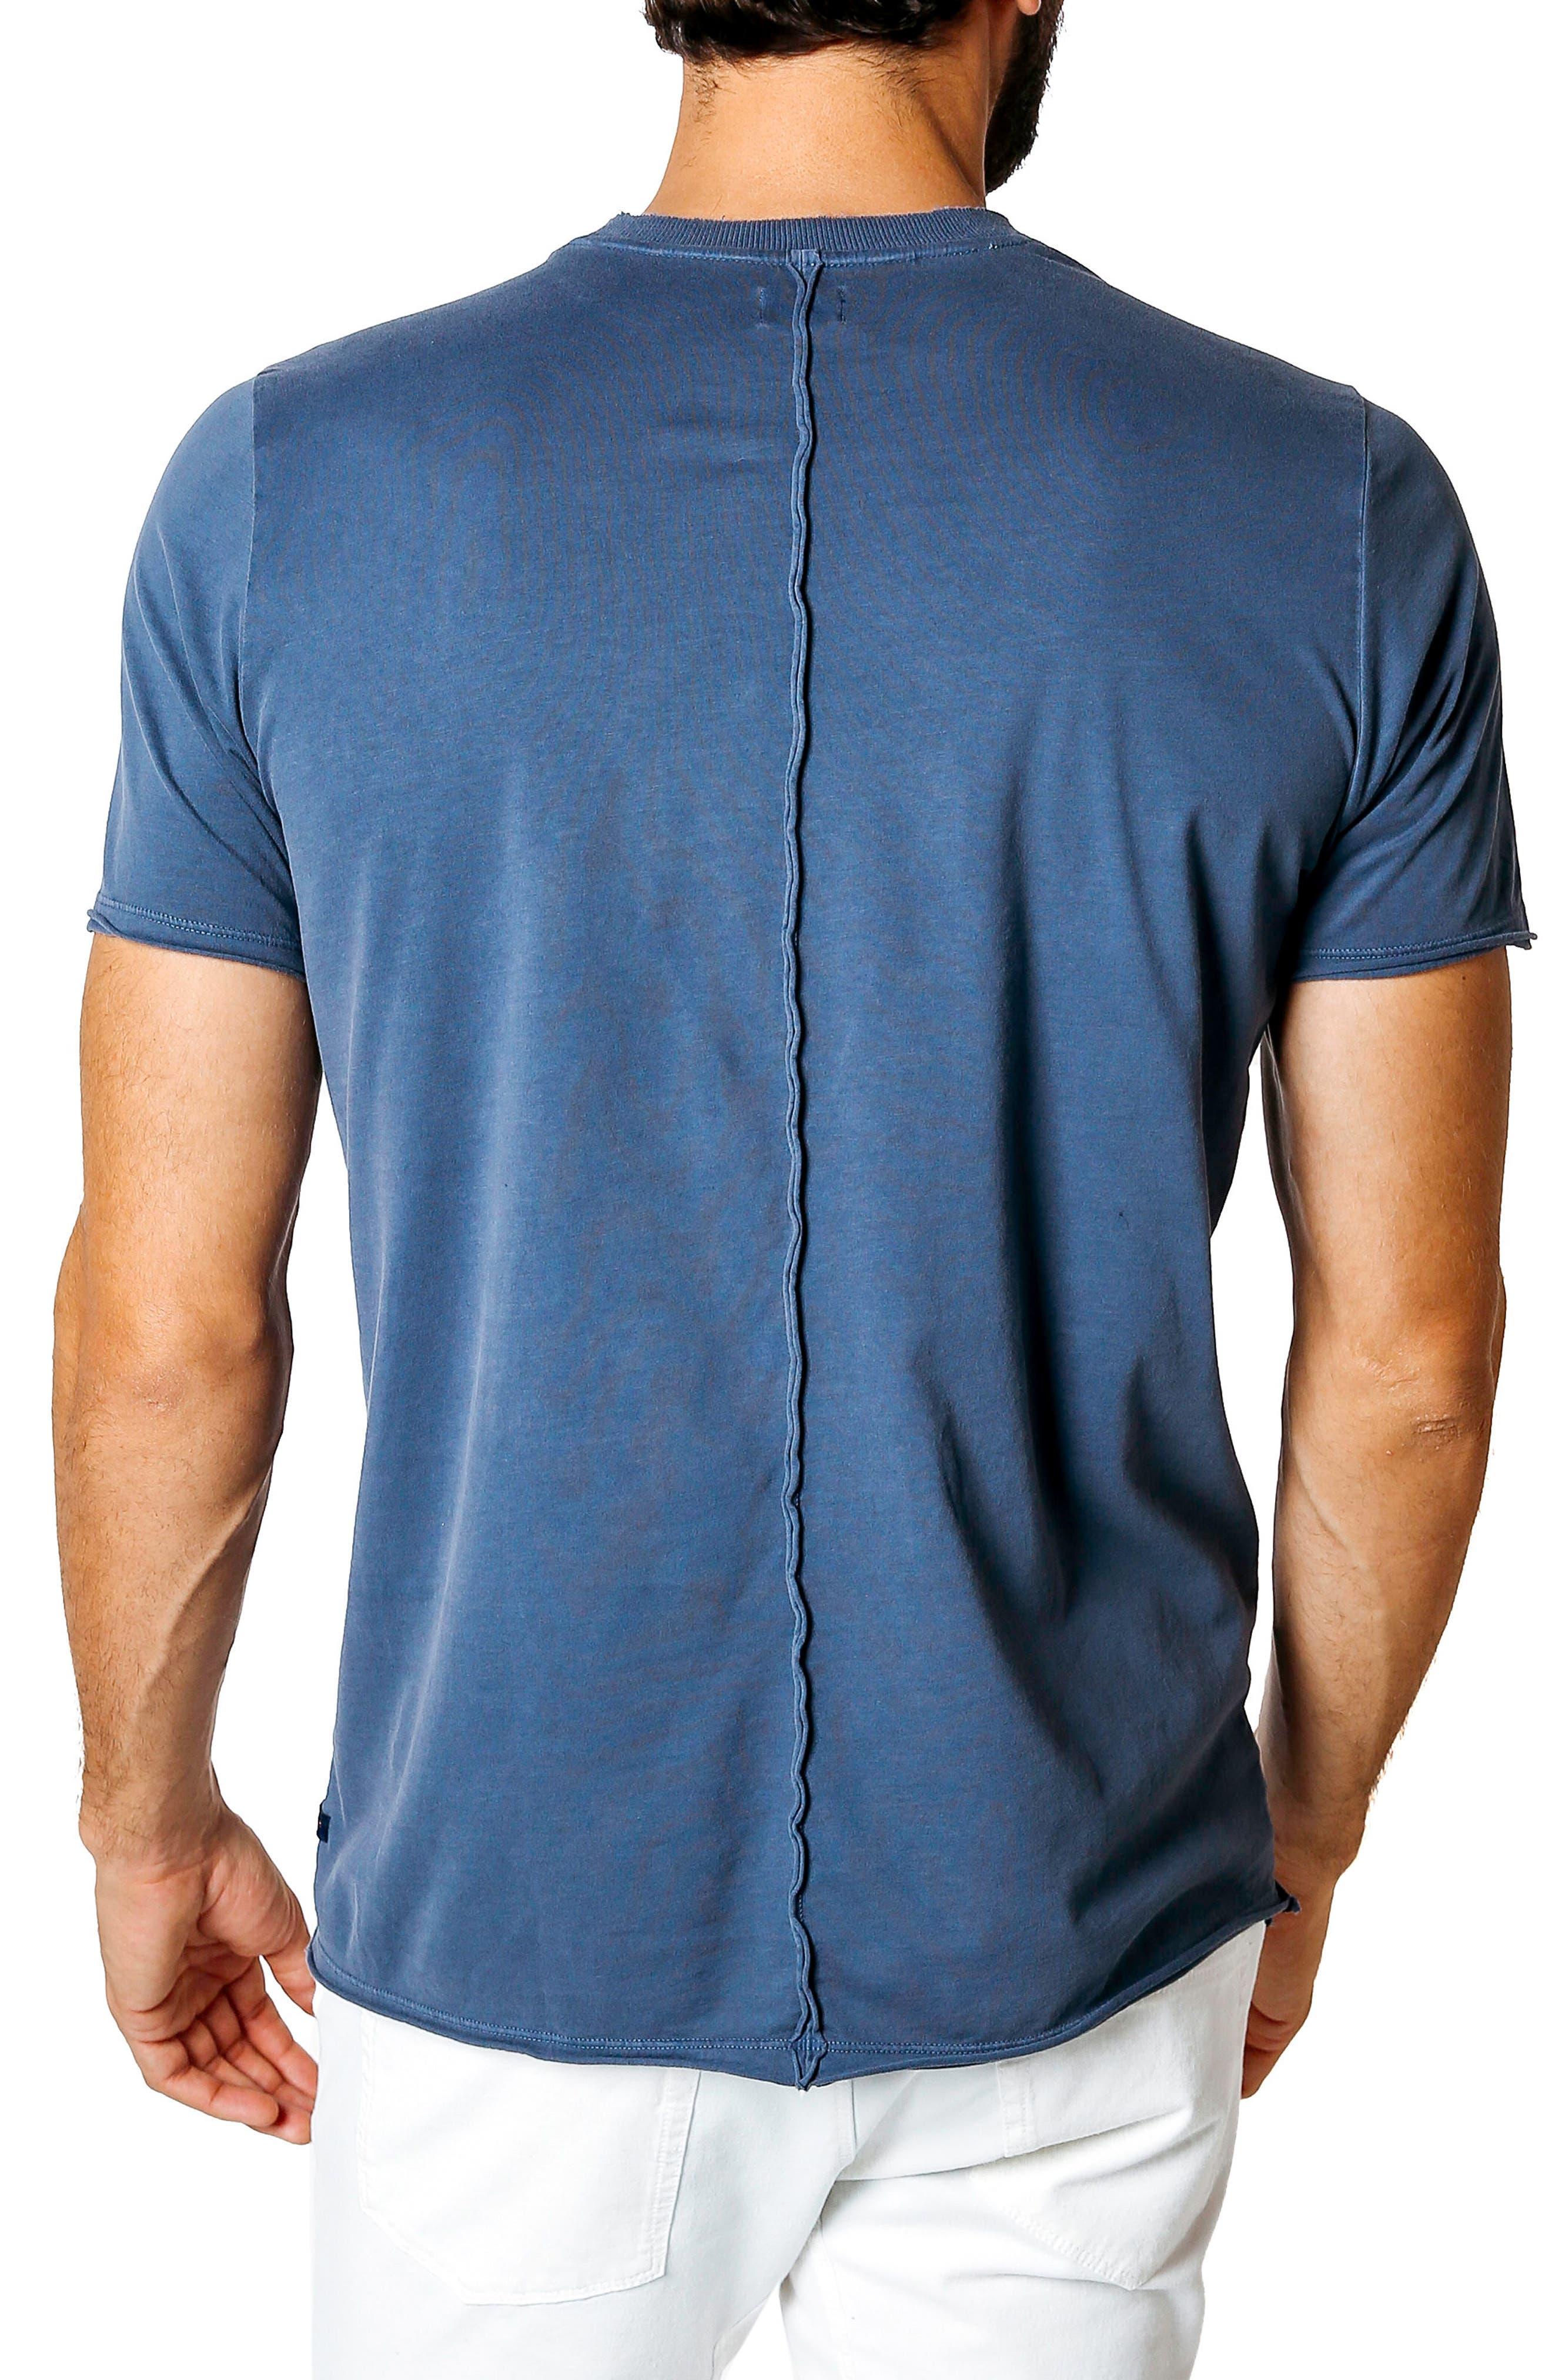 Trim Fit Slub T-Shirt,                             Alternate thumbnail 2, color,                             Denim Blue